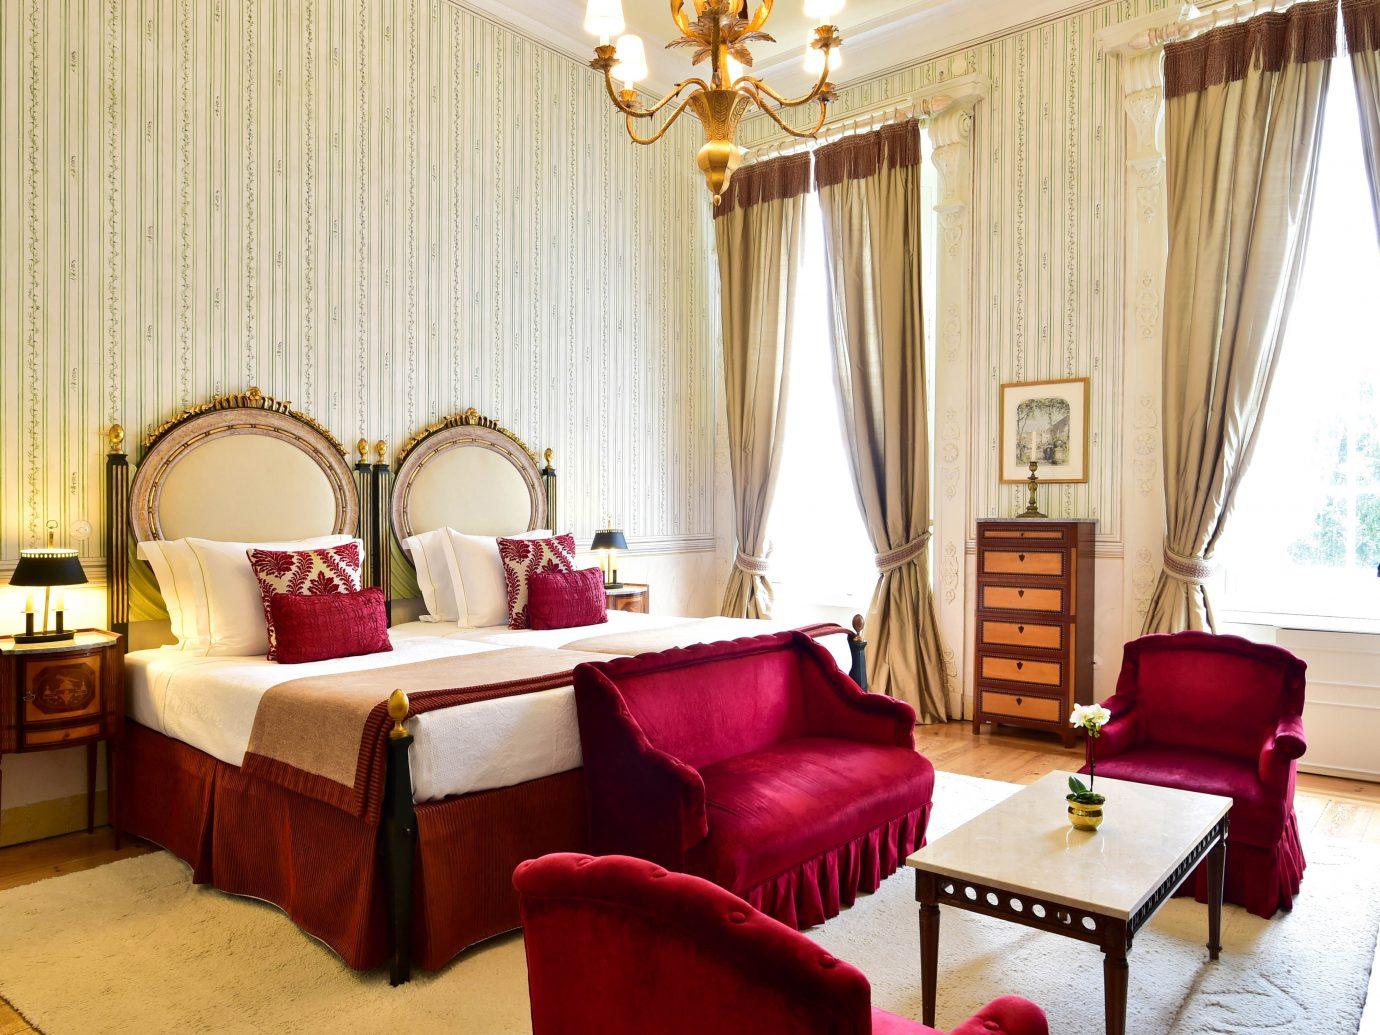 Deluxe bedroom at Tivoli Palacio de Seteais